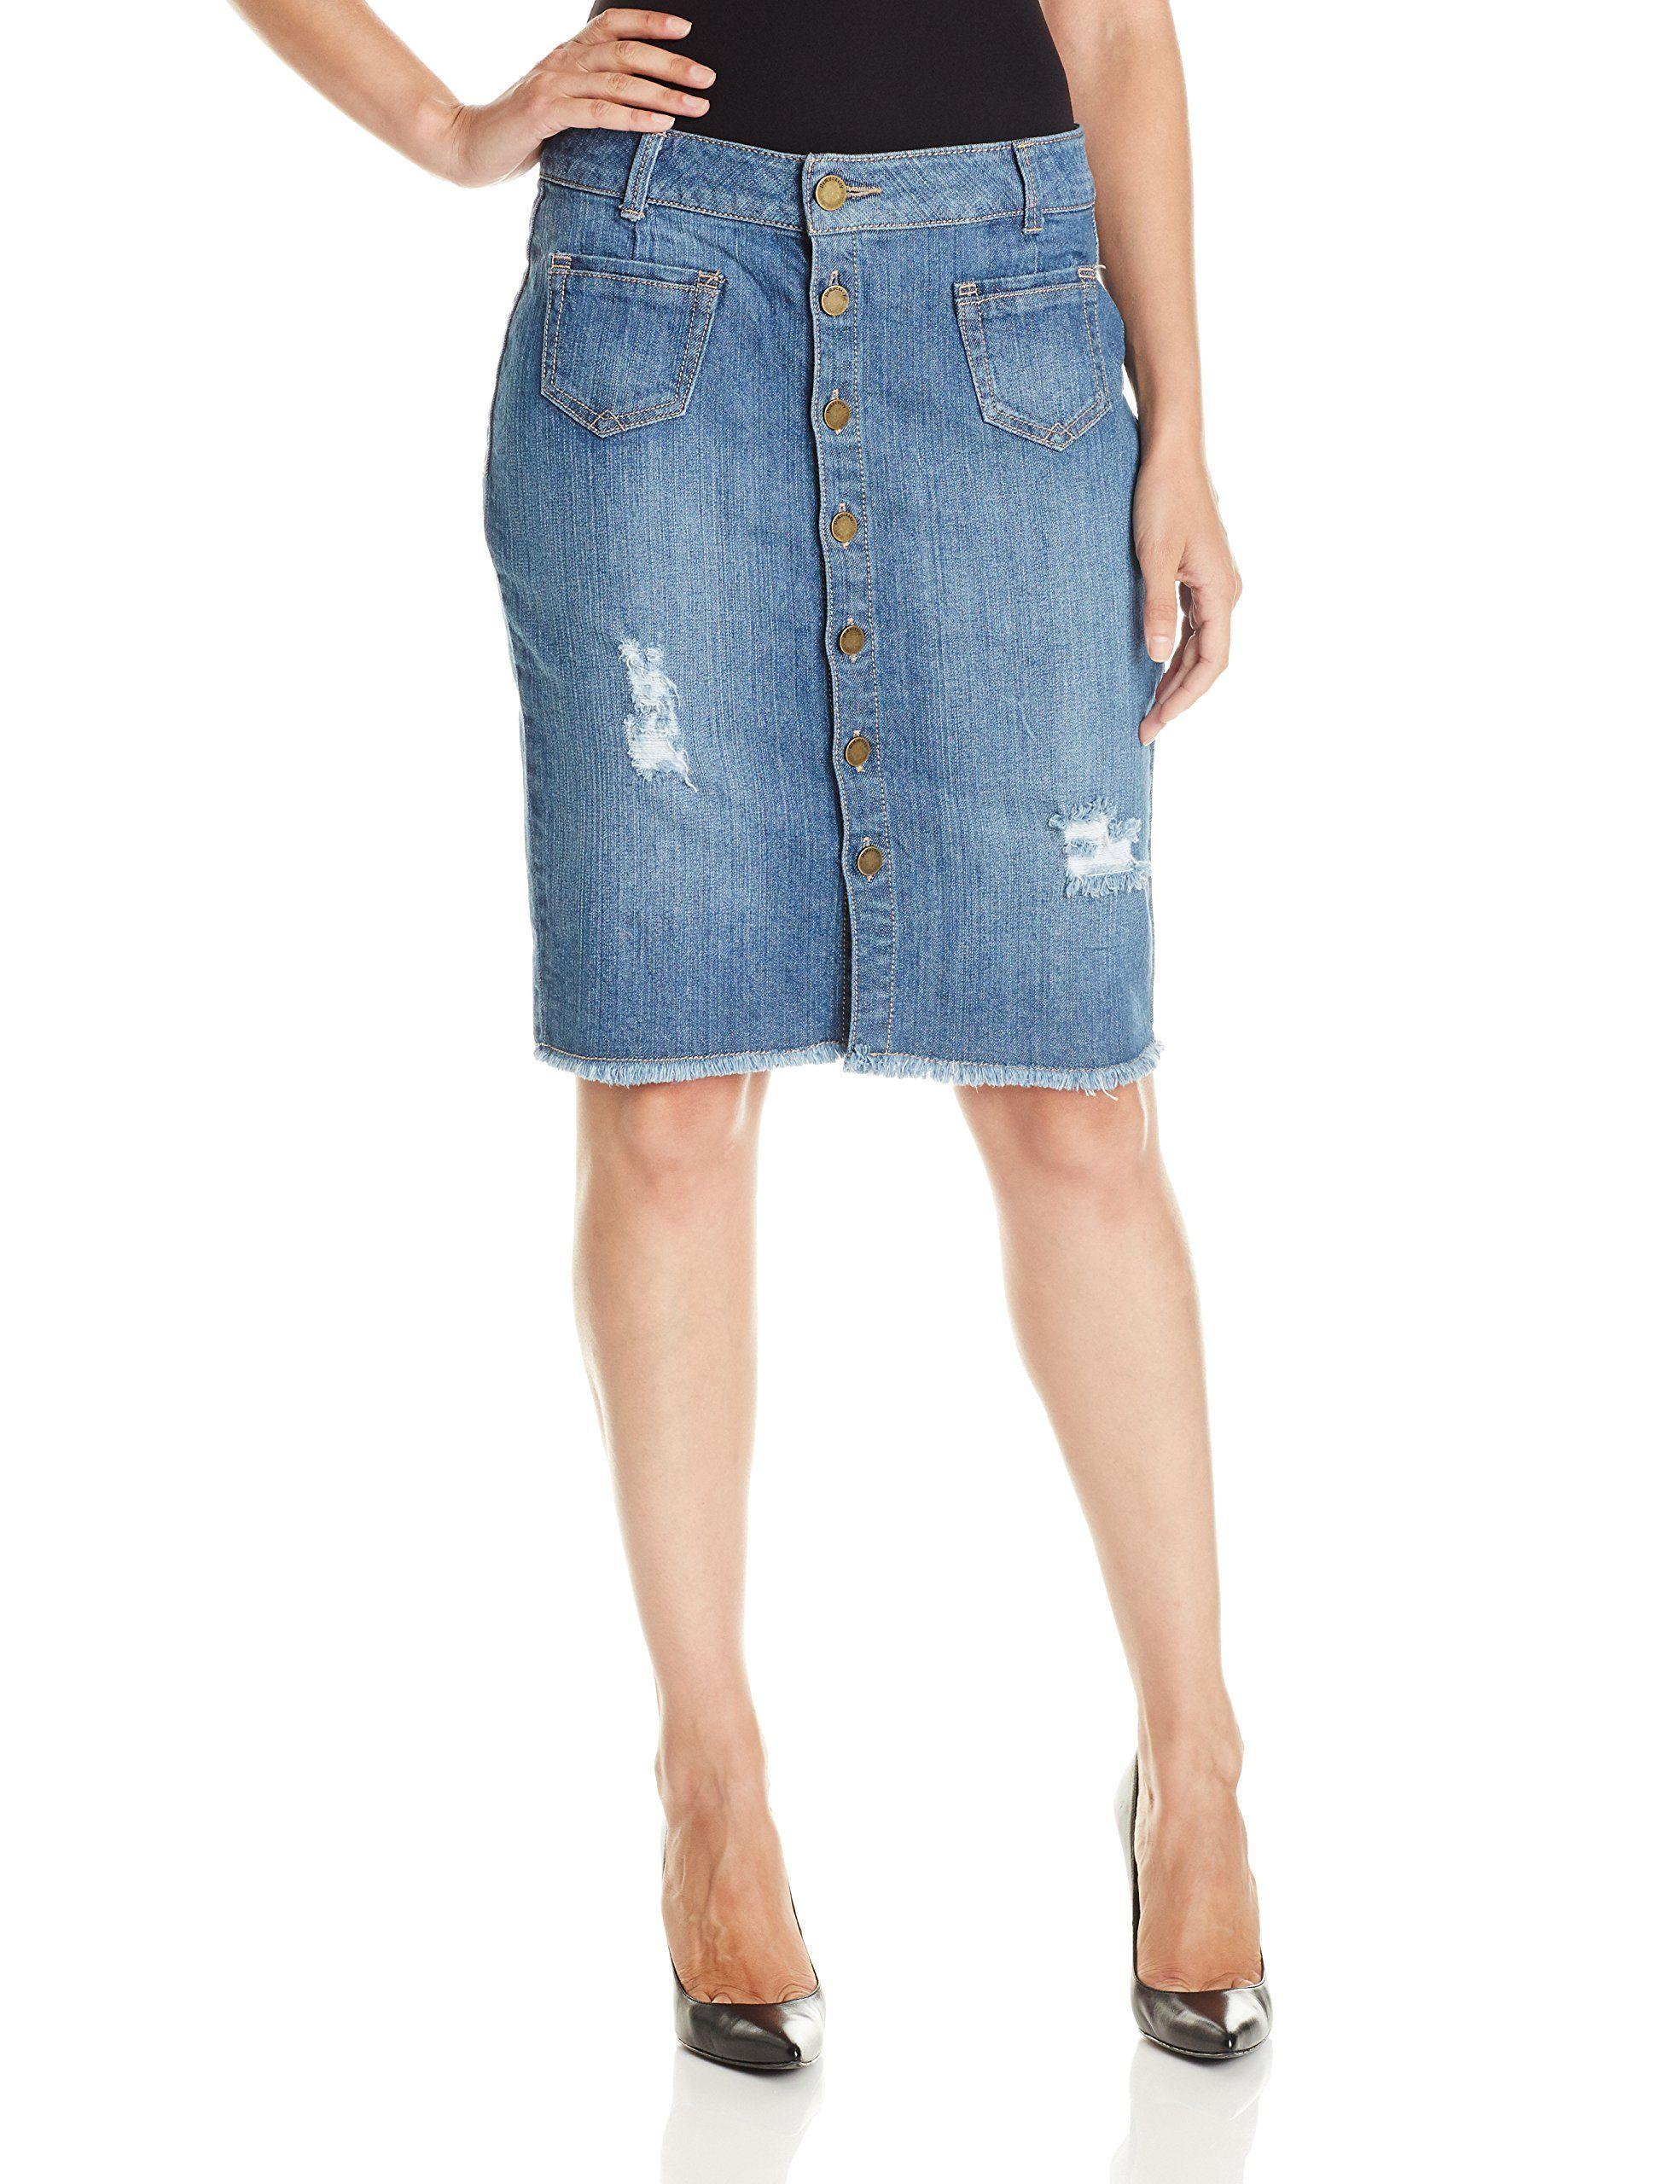 87612ce0ce Democracy Women's 22.5 Inch Destructed Button Down Denim Skirt, Medium  Blue, 8. Knee